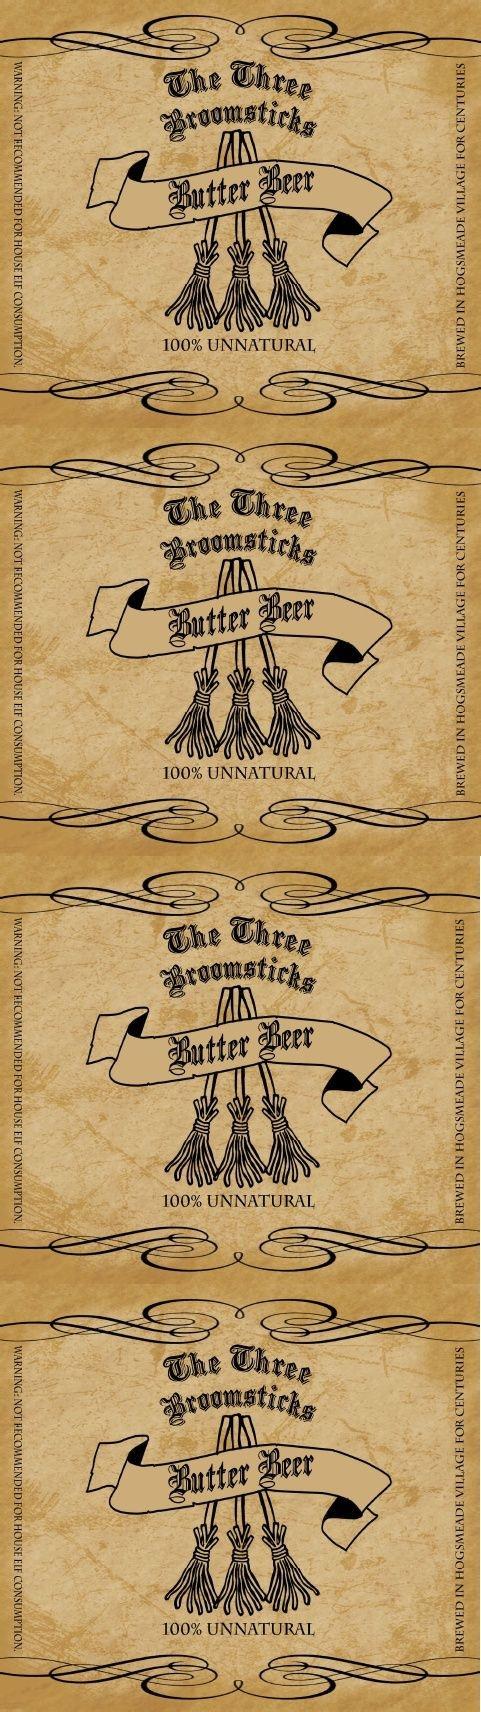 15 Unique Harry Potter Labels Pictures | Waiyiptat - Free Printable Butterbeer Labels